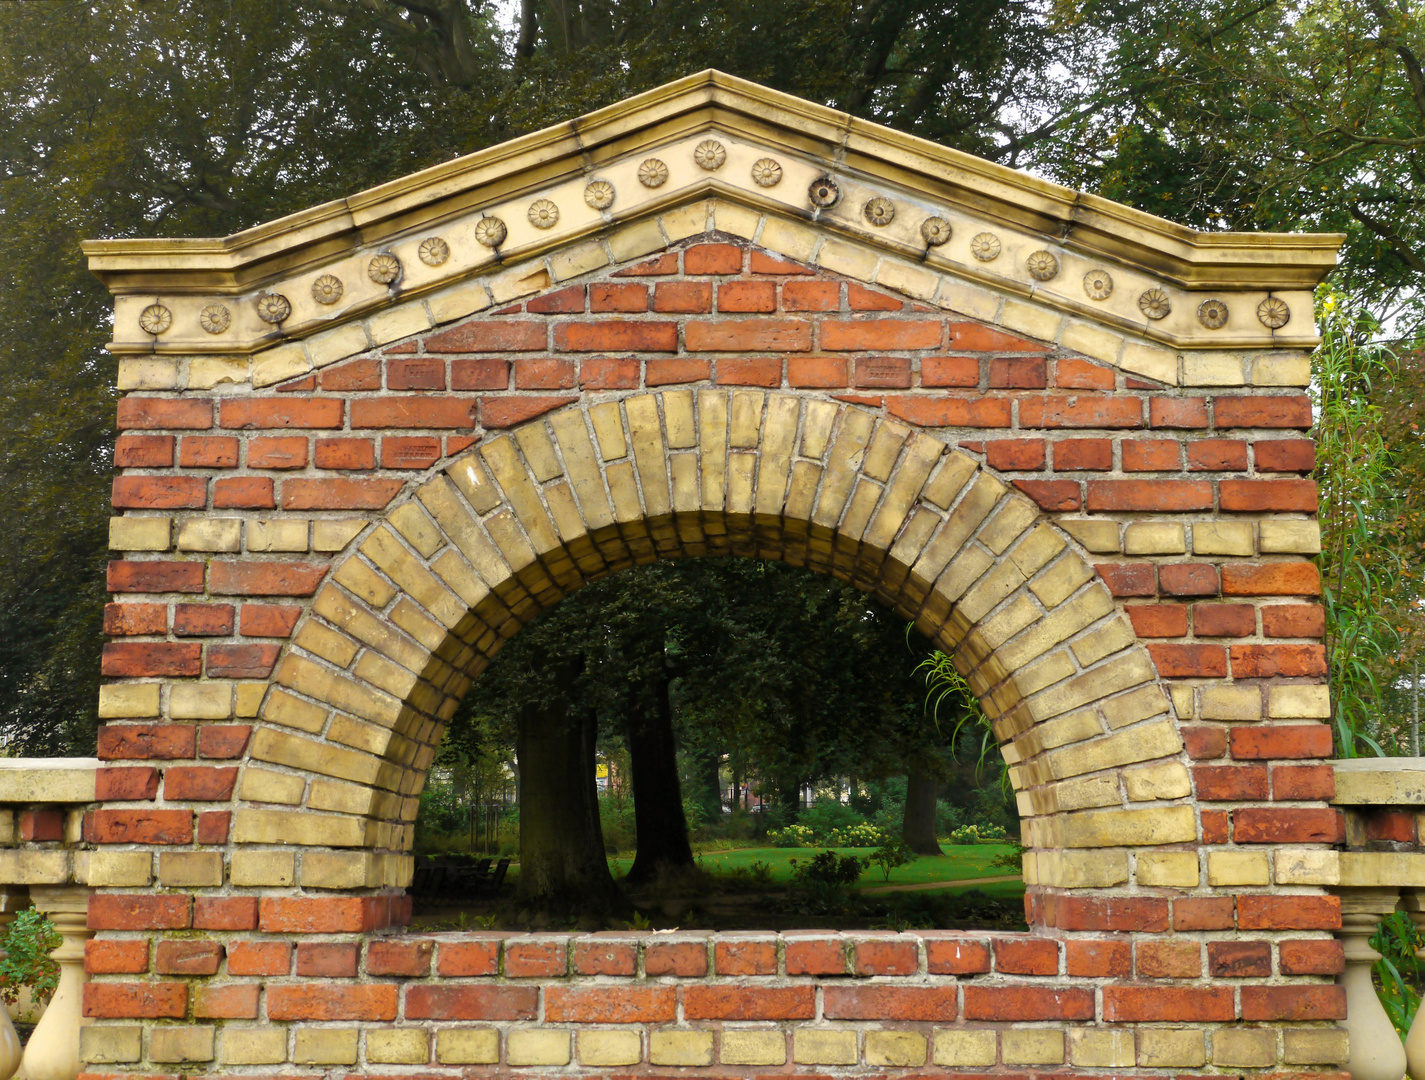 Blick in den Garten der Villa Schöningen...